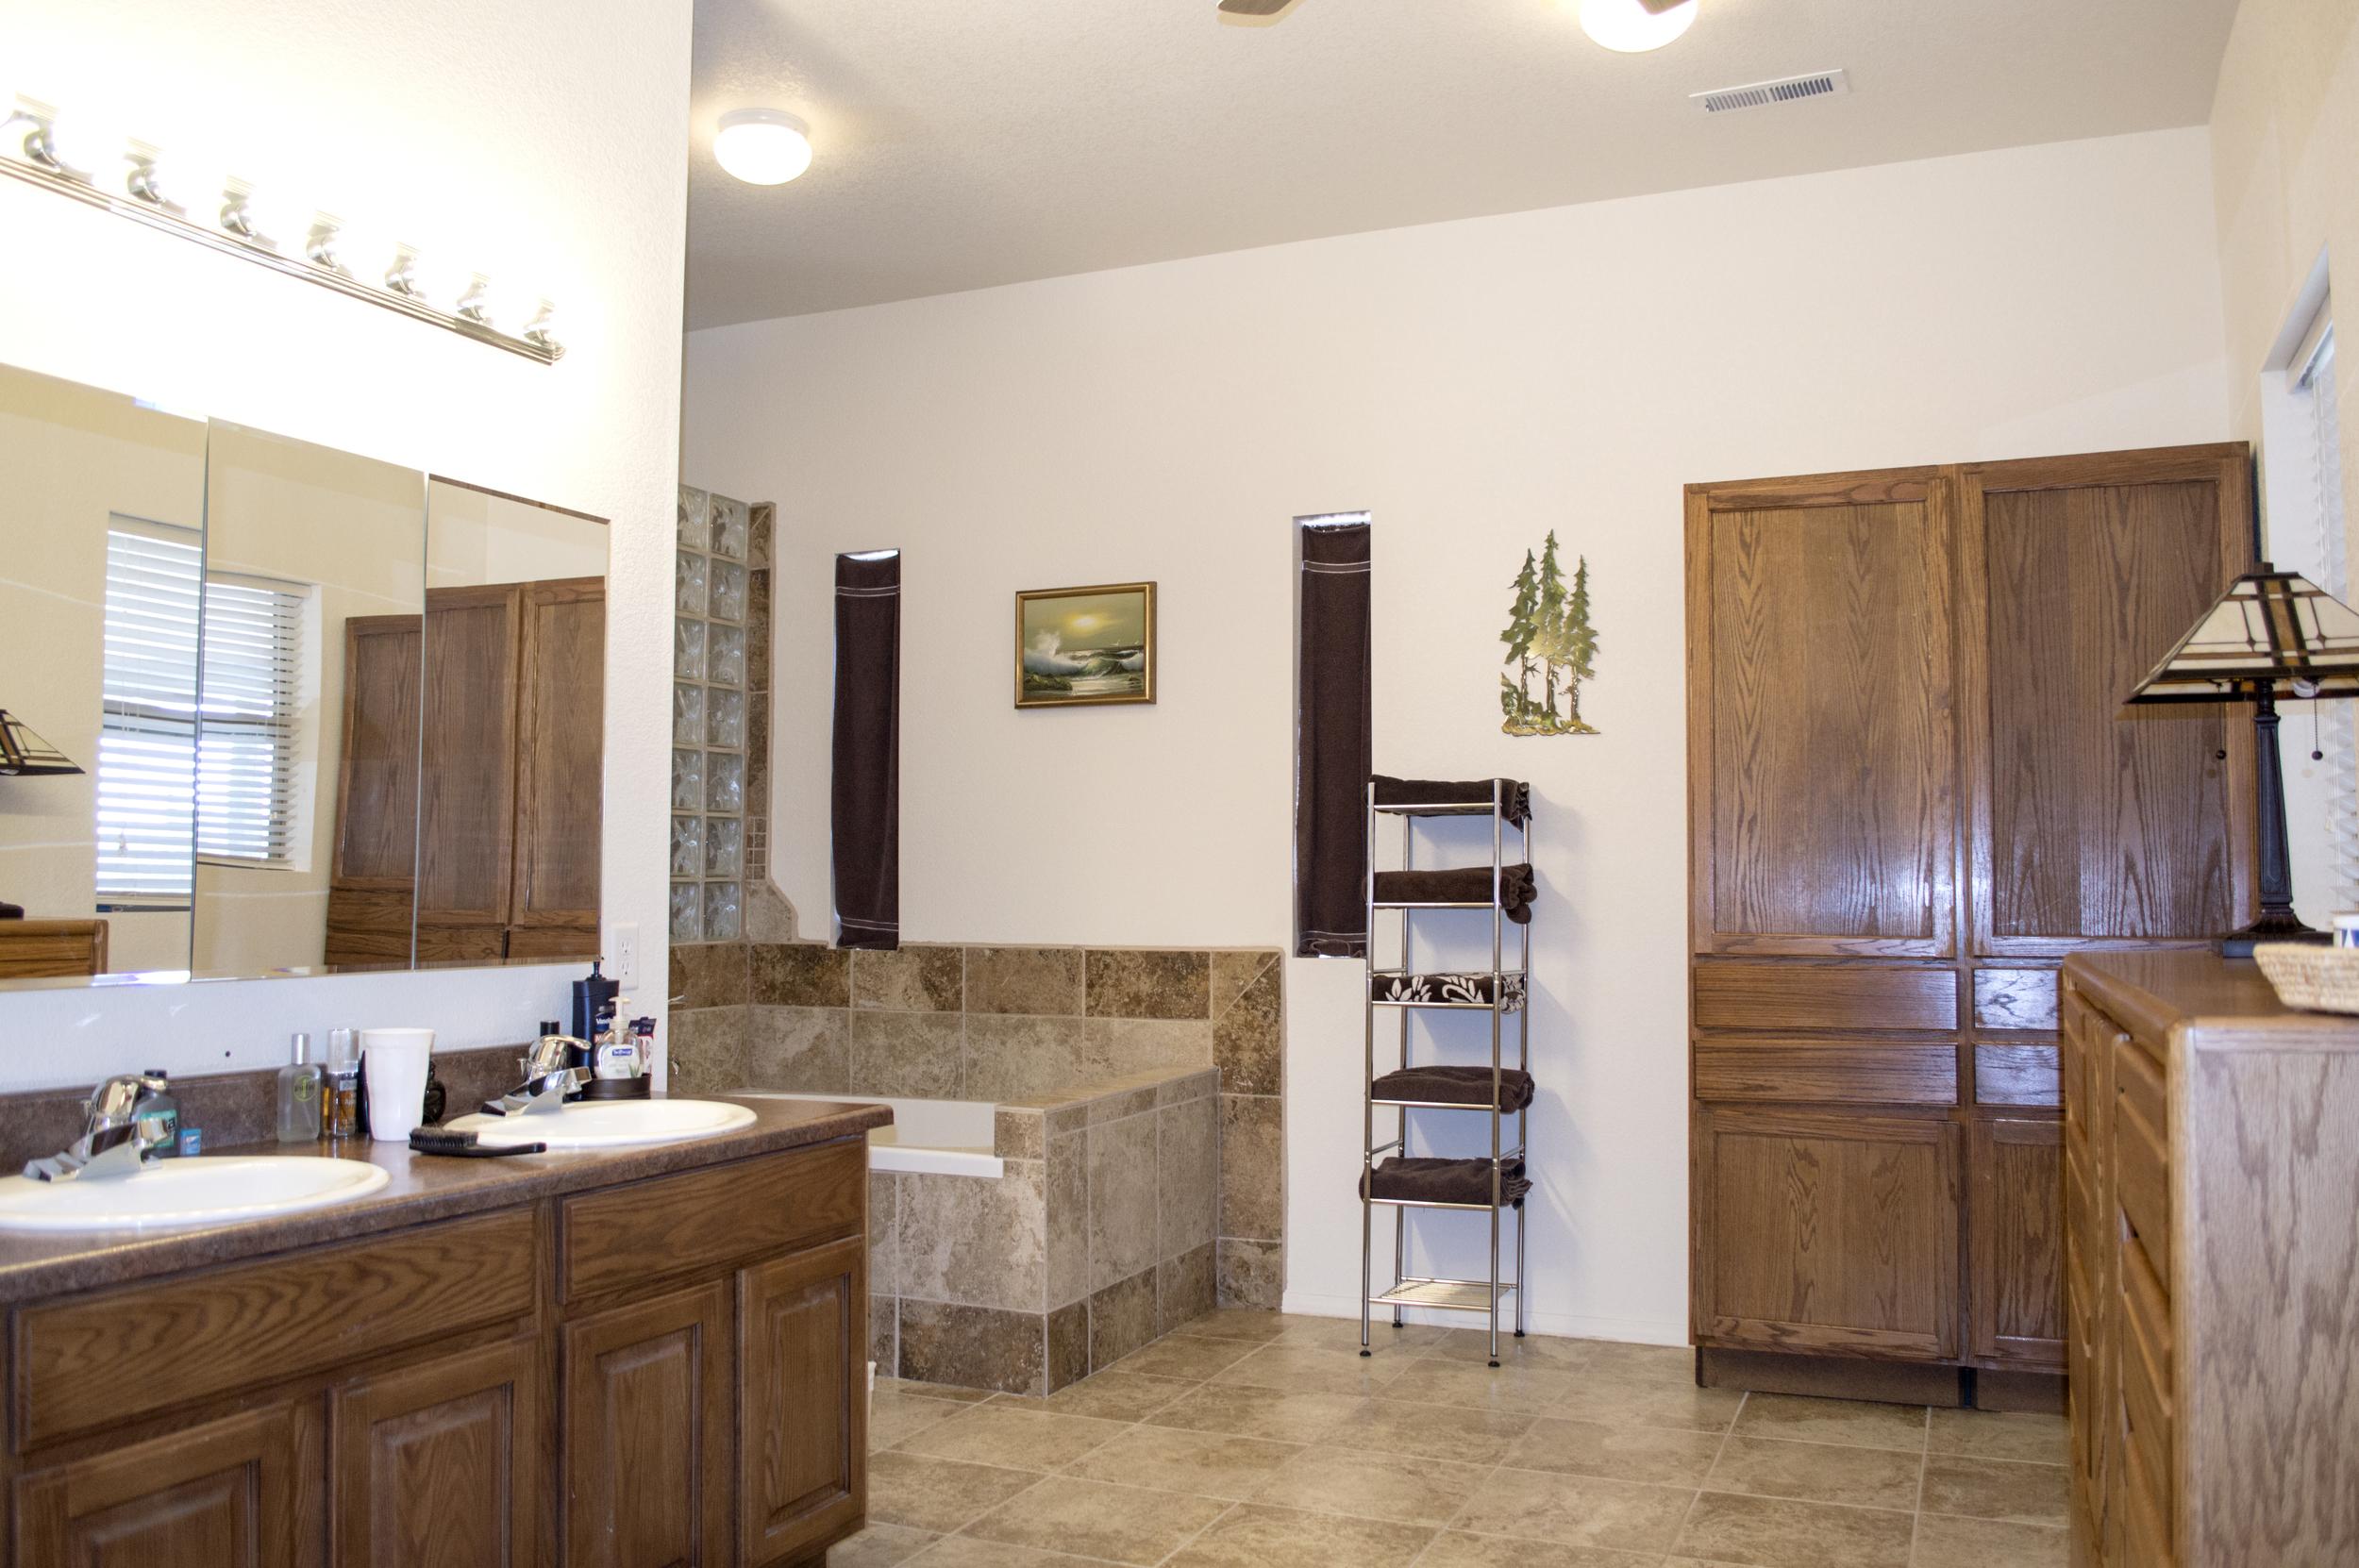 Bathroom of a residential custom home near Flagstaff, Arizona.